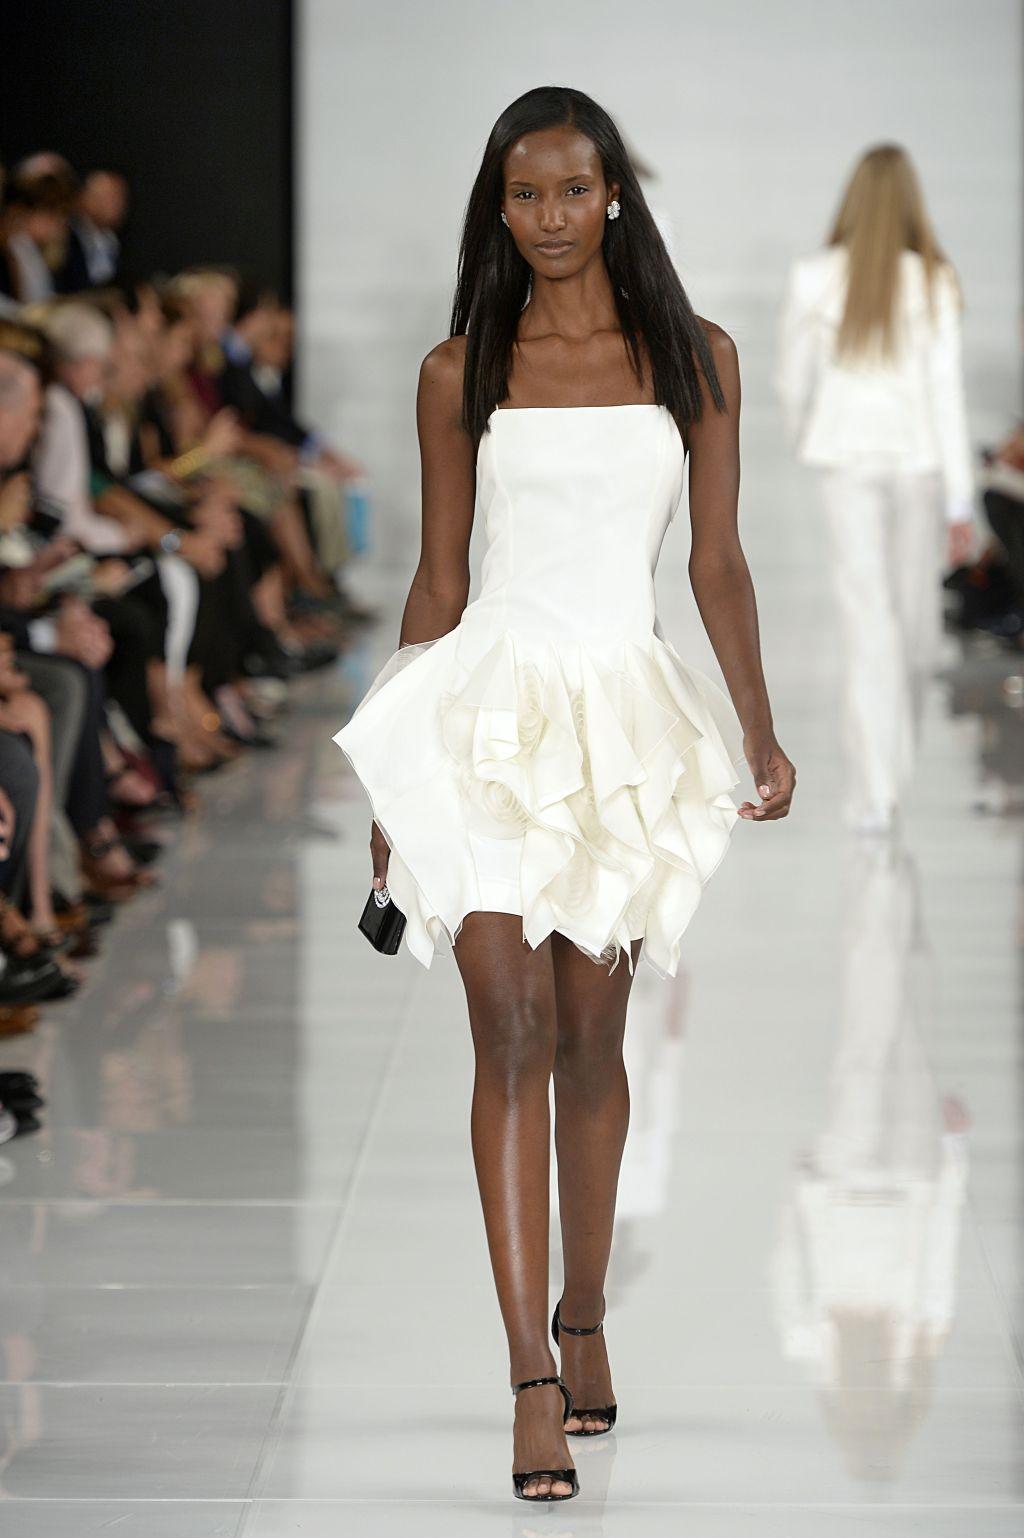 Ralph Lauren - Runway - Mercedes-Benz Fashion Week Spring Summer 2014